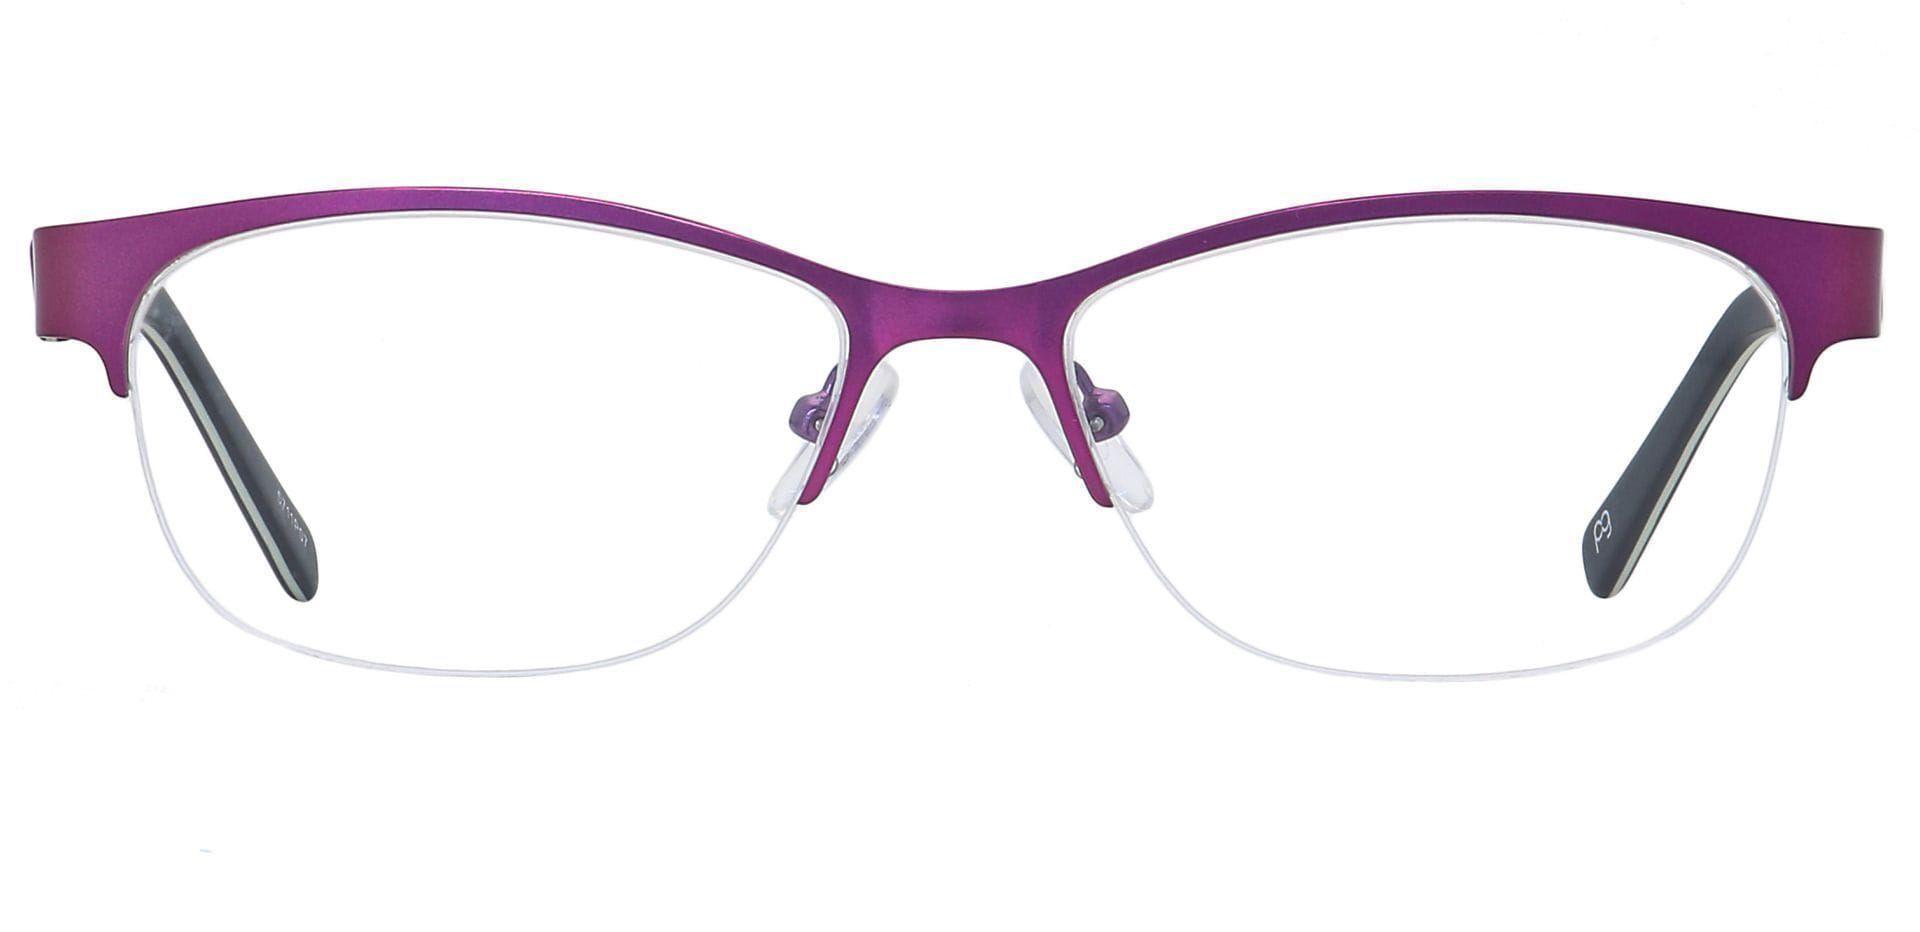 Nova Round Progressive Glasses - Purple